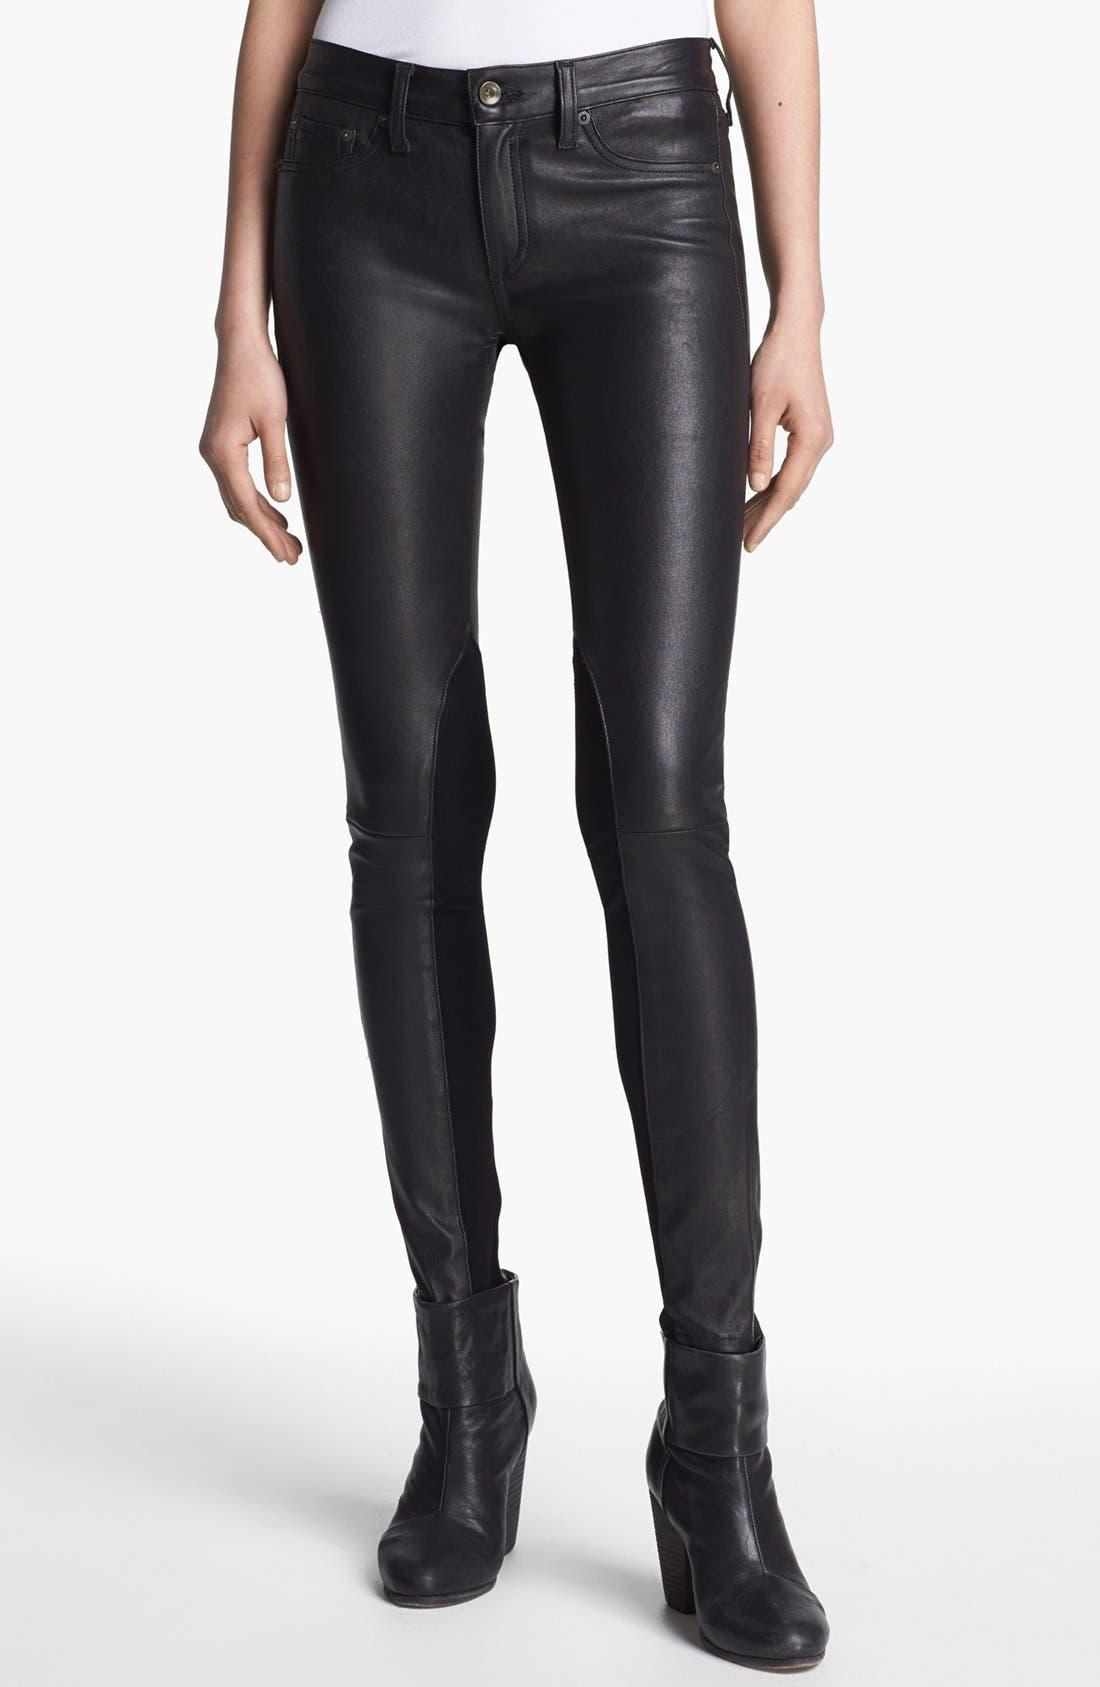 Main Image - rag & bone/JEAN 'The Reverse' Leather Pants